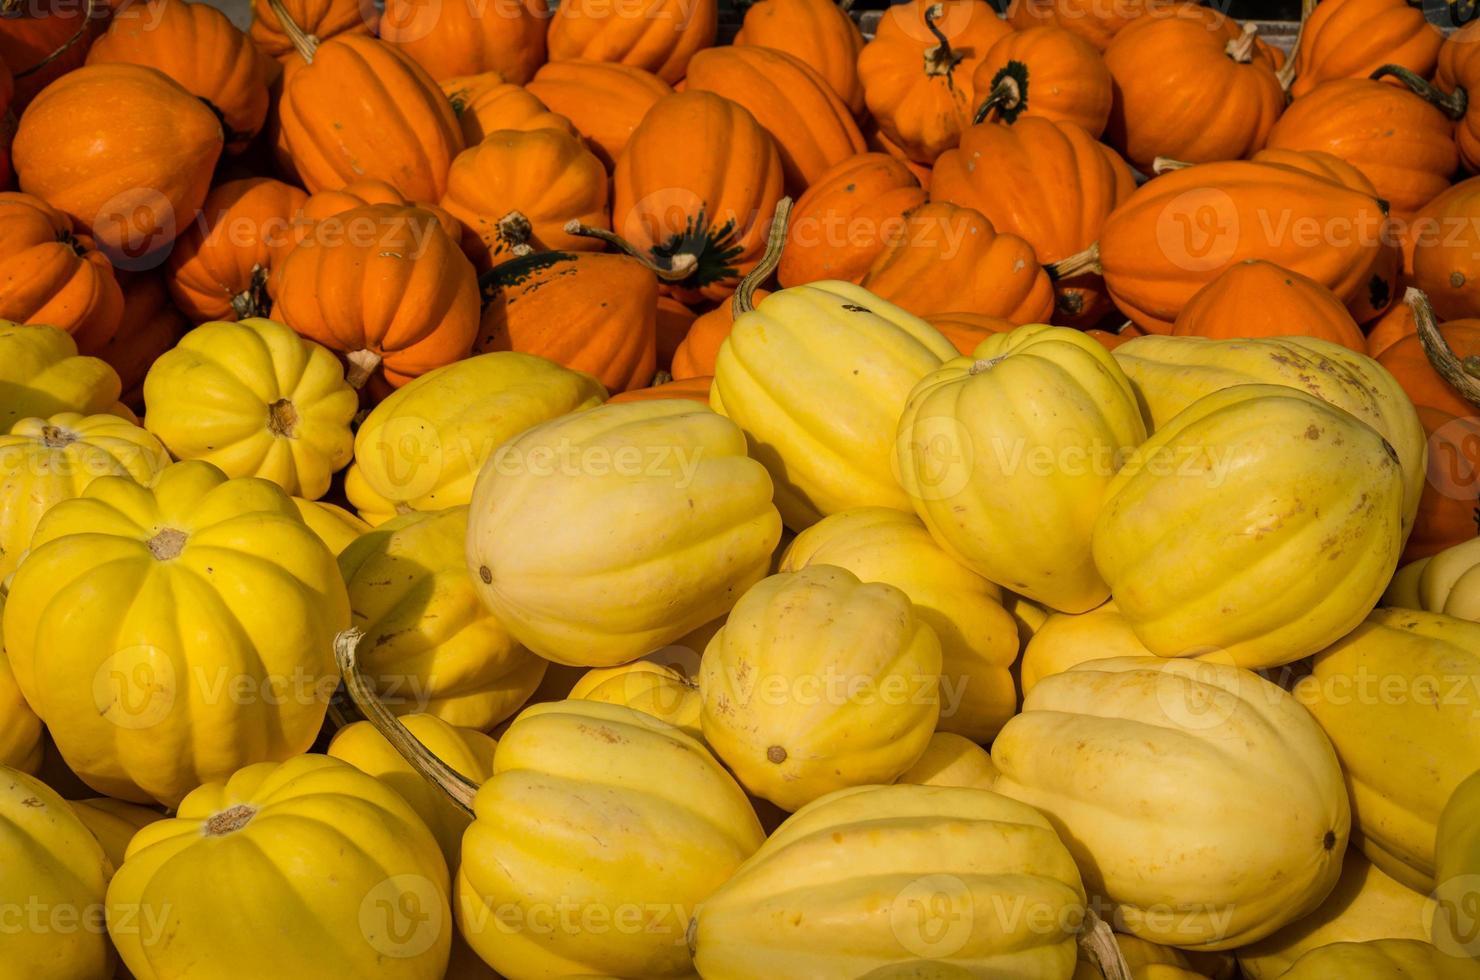 calabaza bellota amarilla y naranja foto